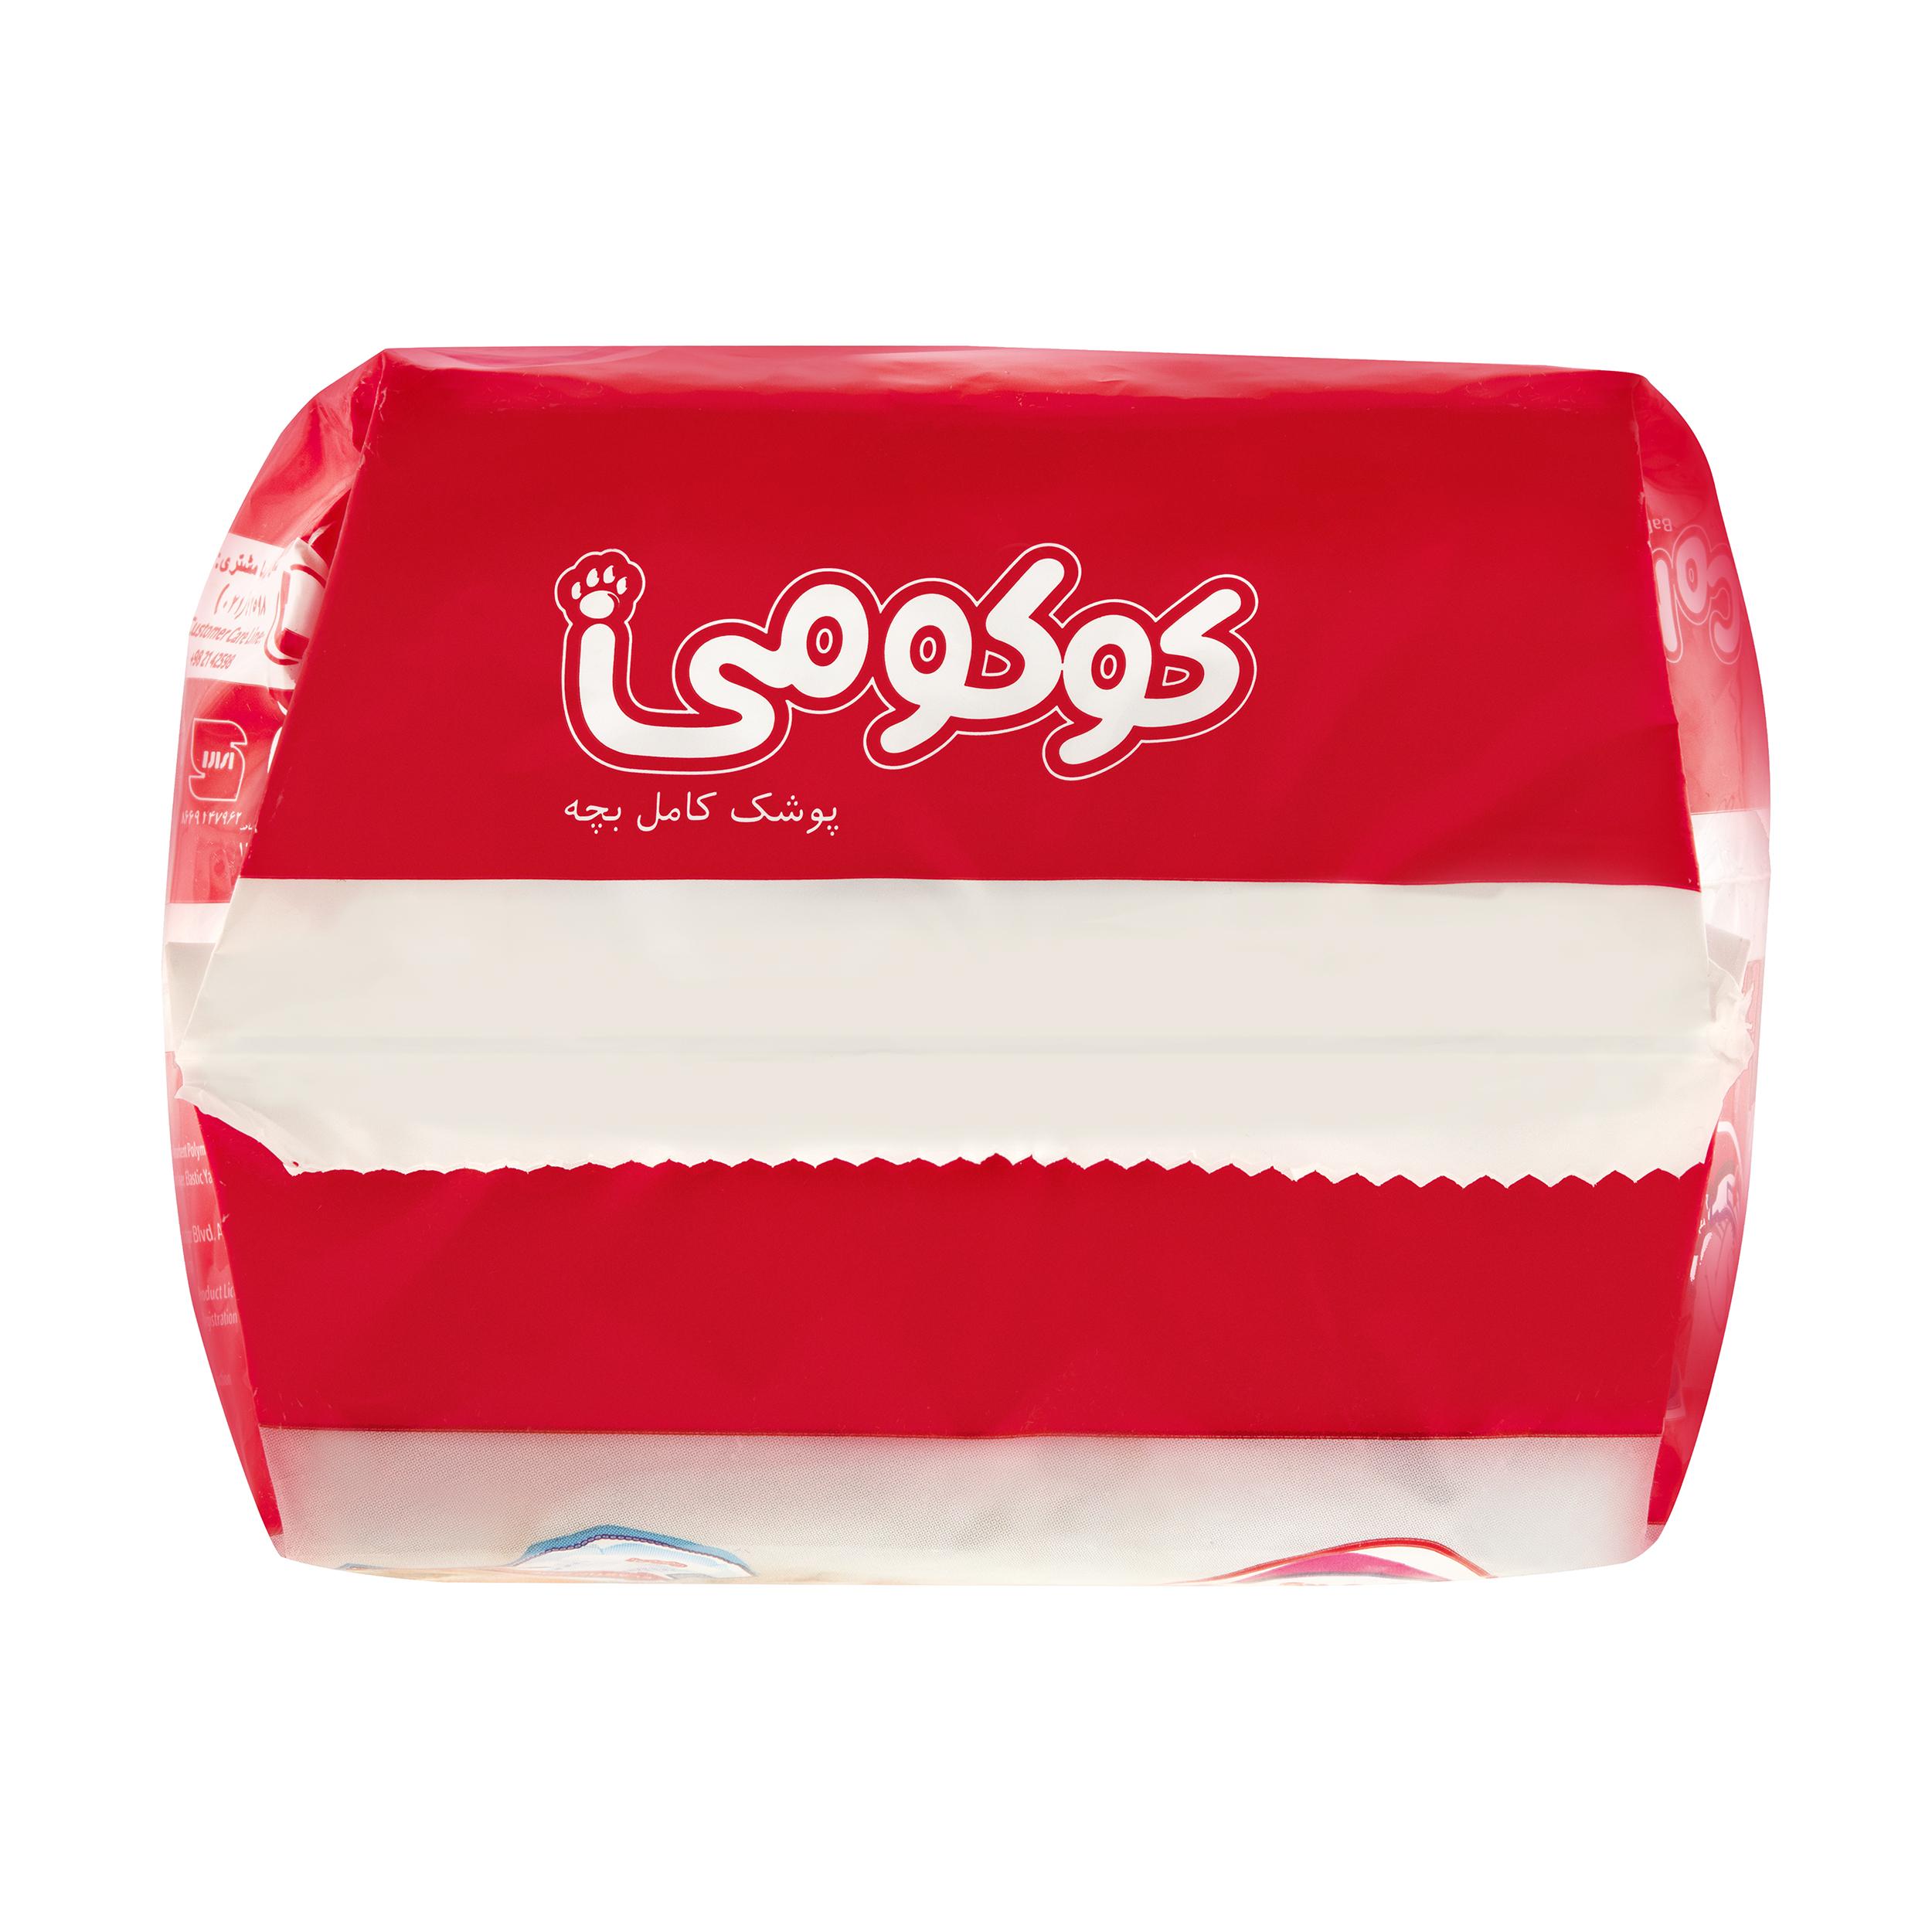 پوشک کوکومی مدل Red سایز 2 بسته 10 عددی main 1 3